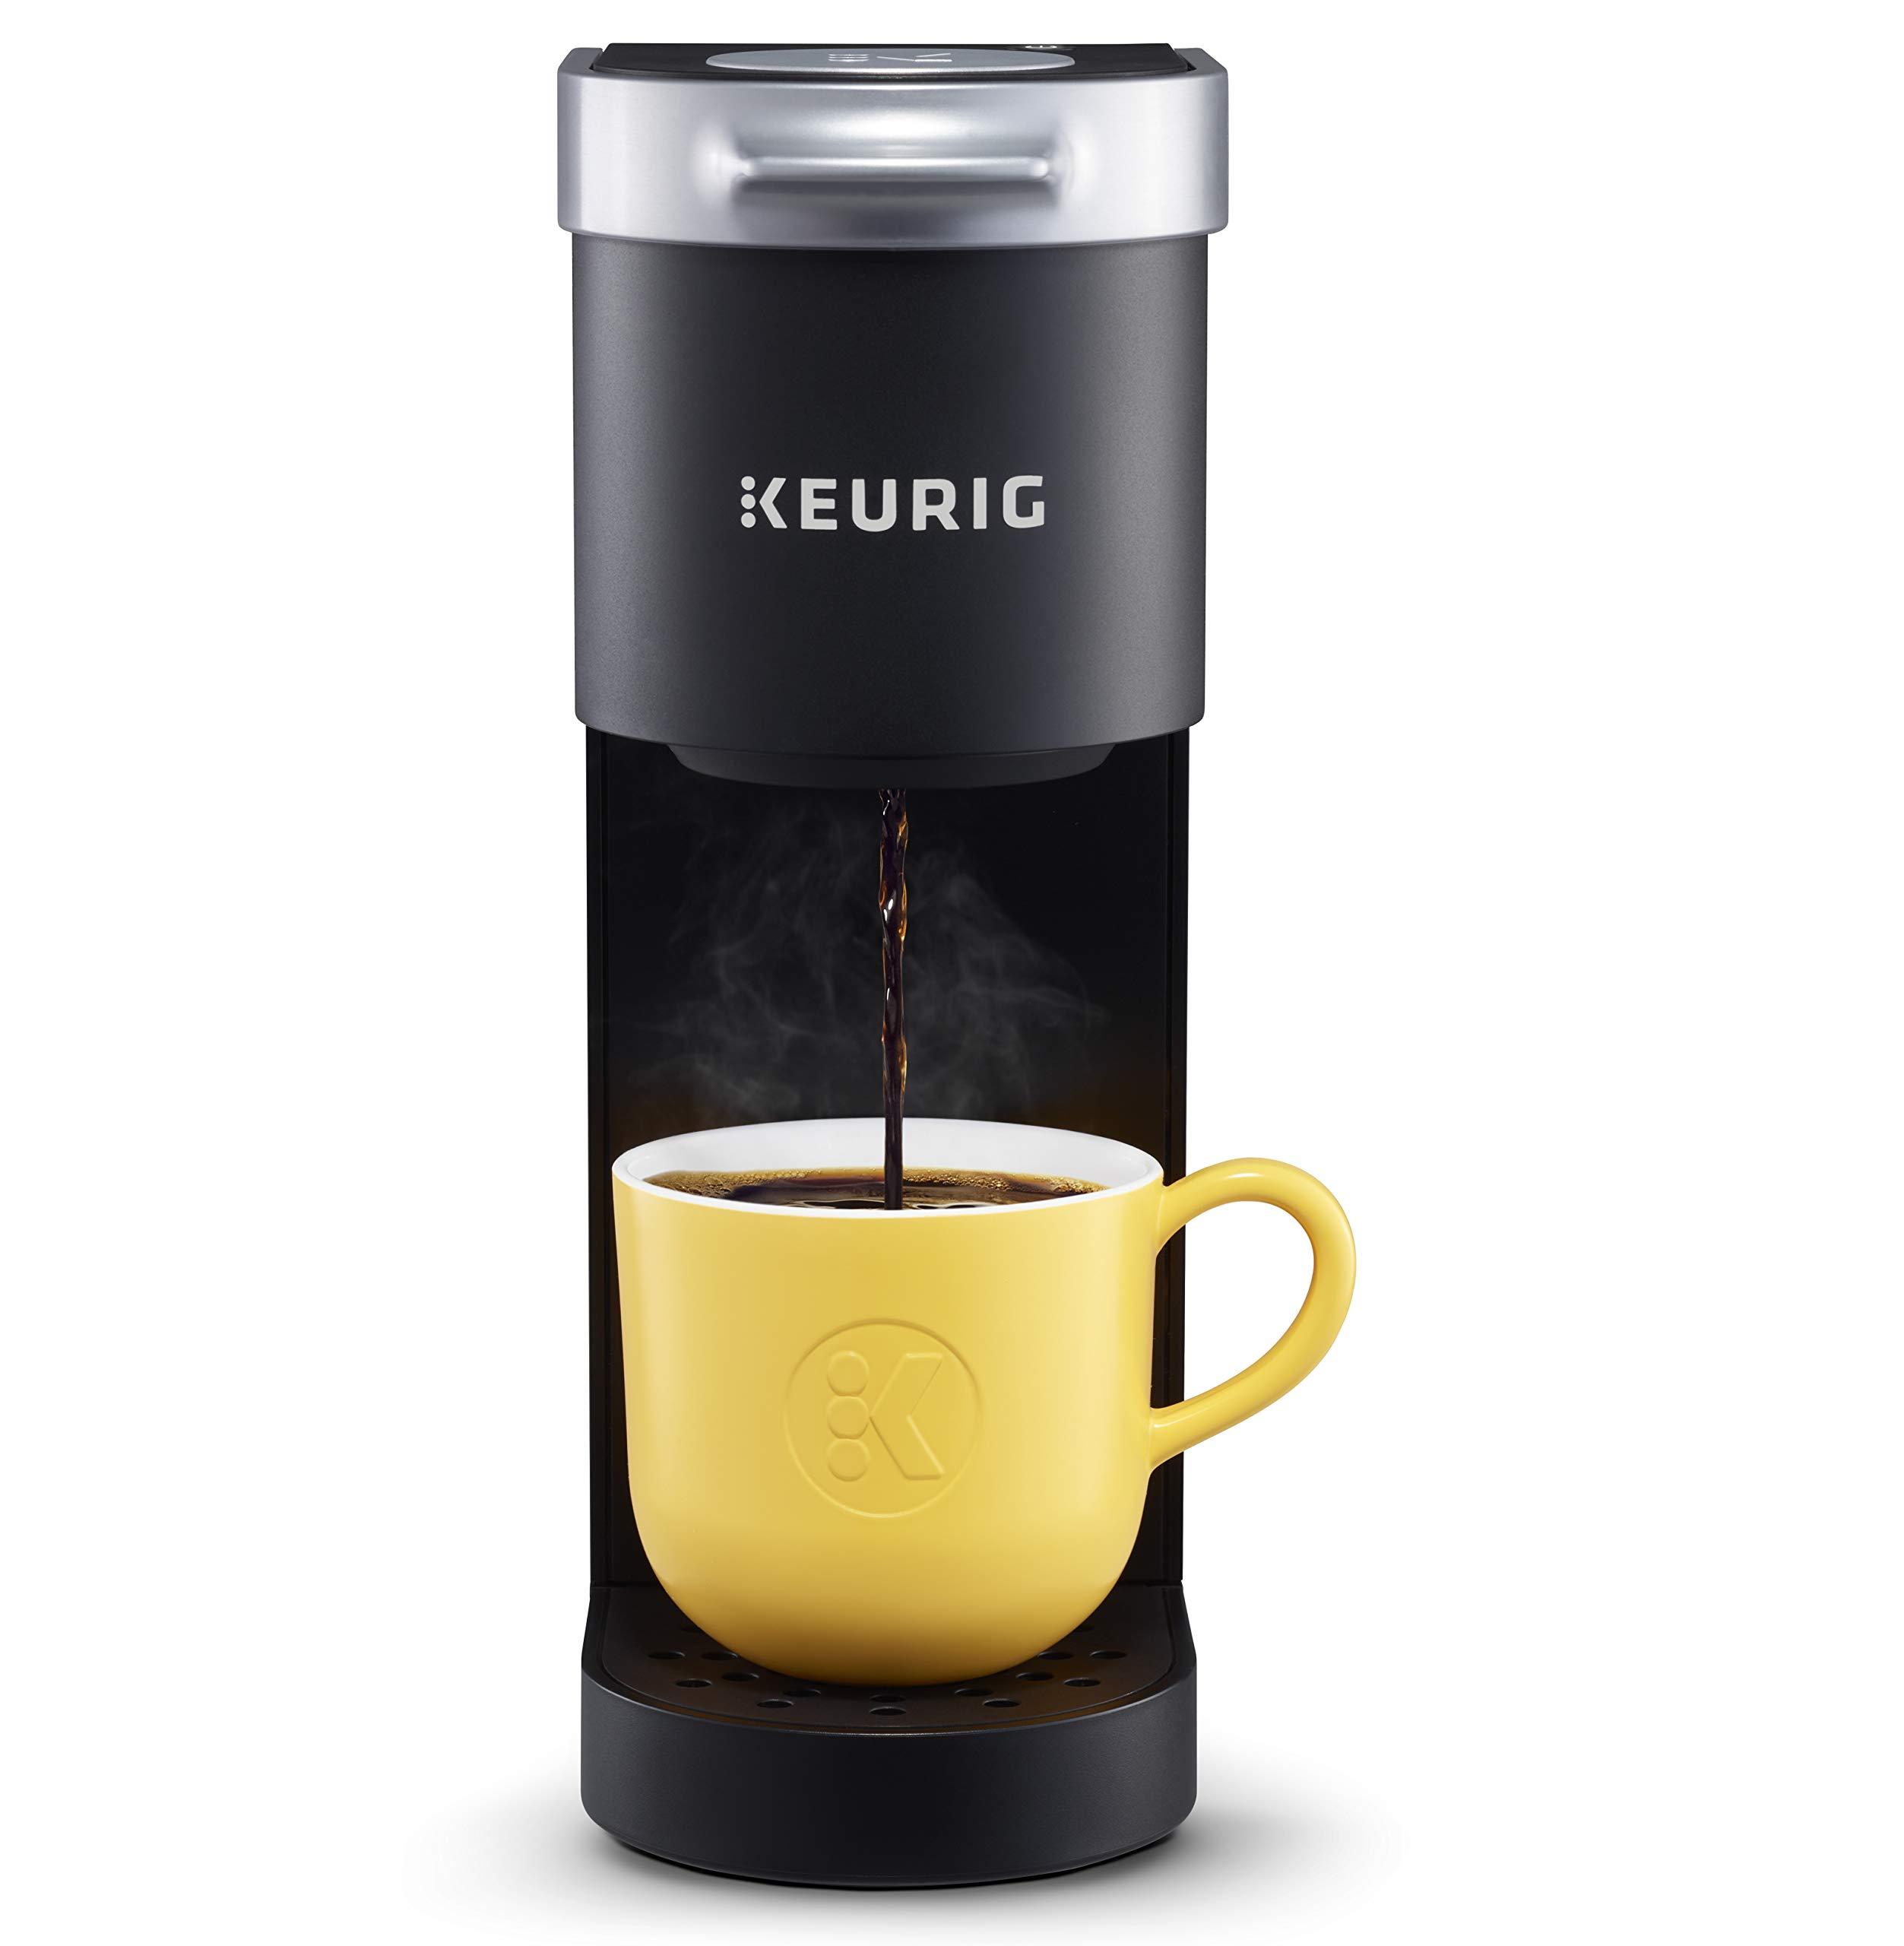 Keurig K-Mini Single Serve Coffee Maker, Black